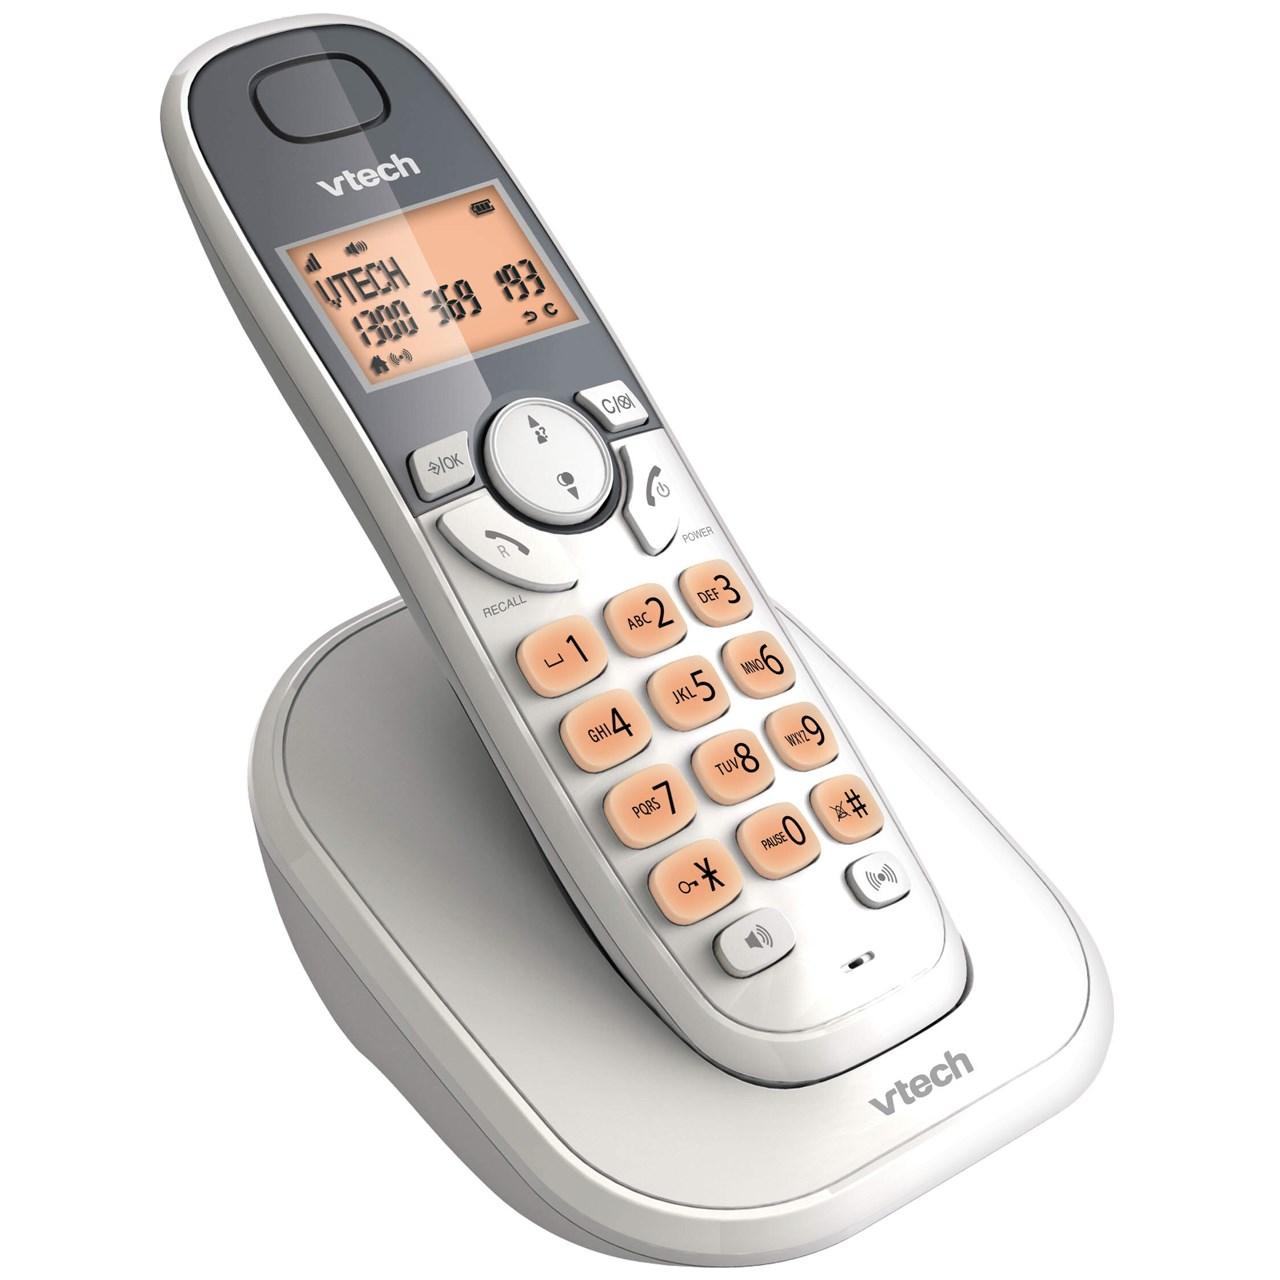 فروش اقساطی تلفن بی سیم وی تک مدل ES1001